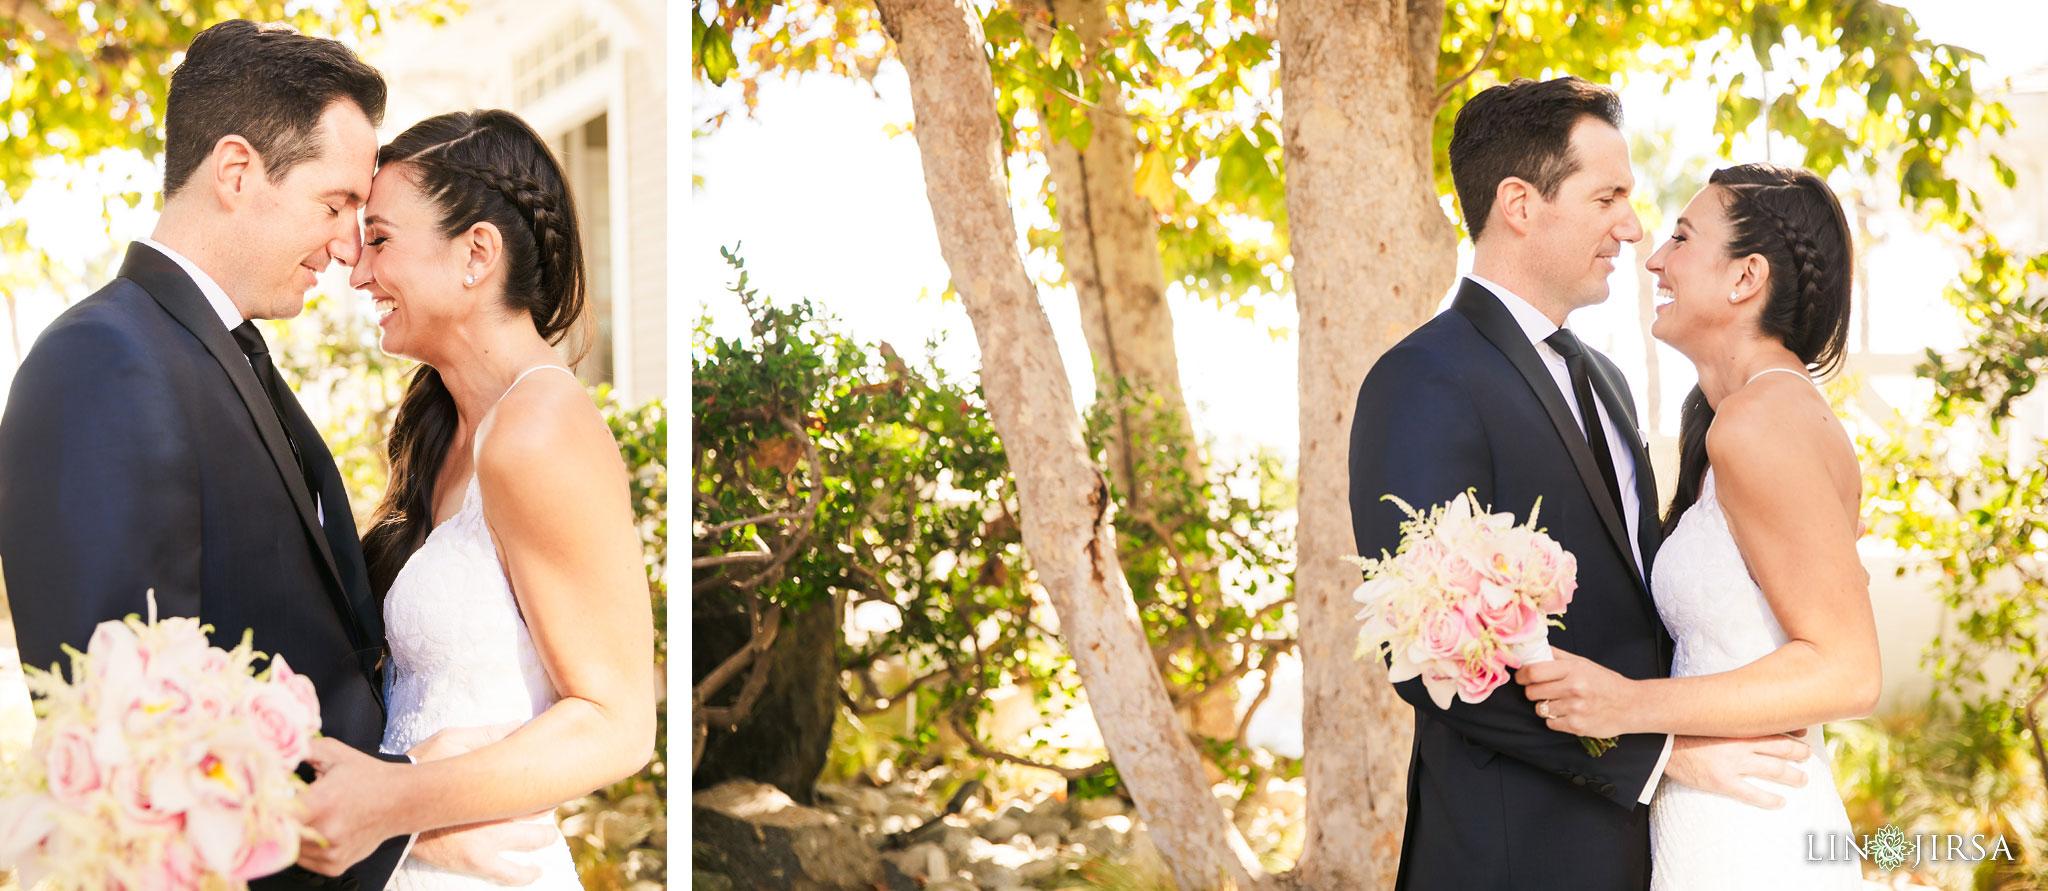 16 Shutters on the Beach Santa Monica Wedding Photography